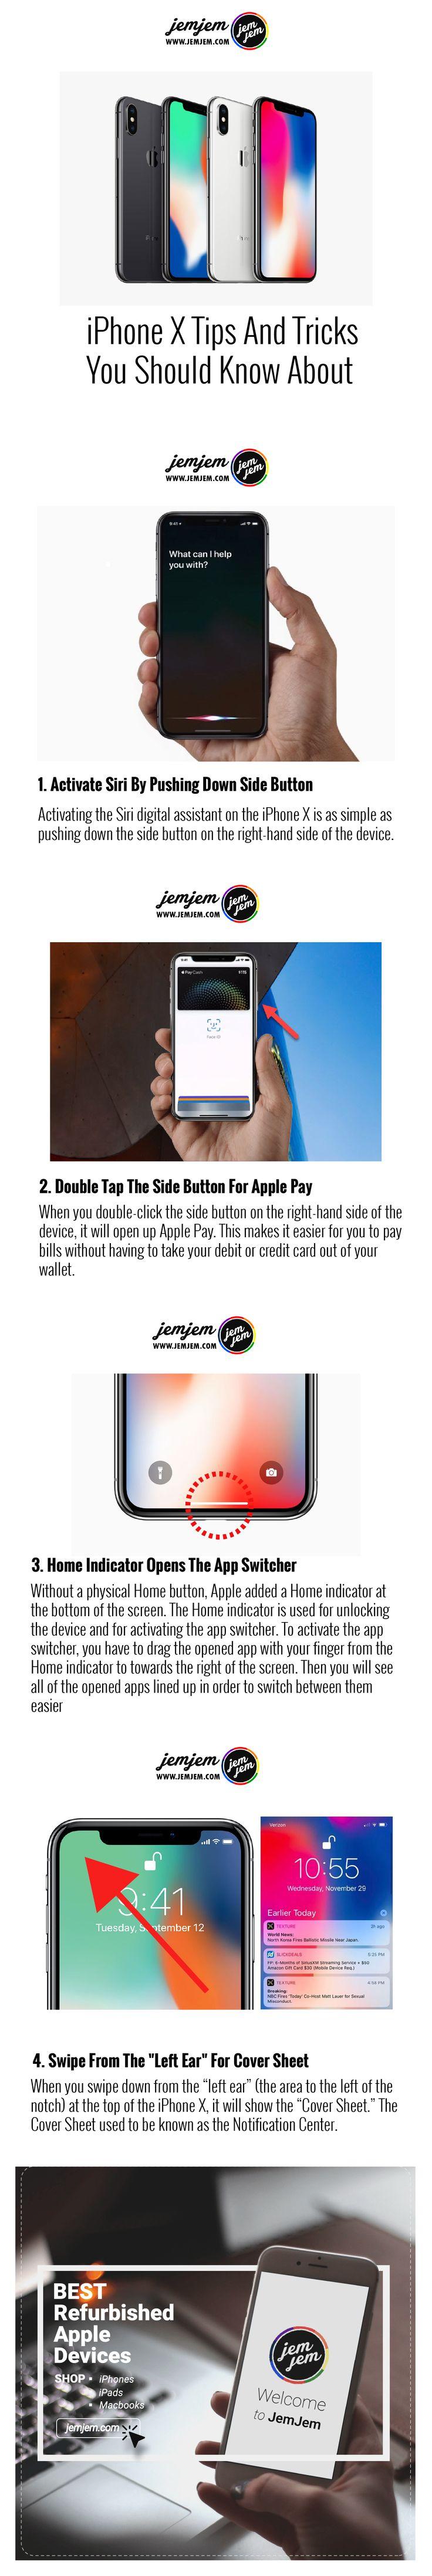 The 189 best apple tips images on Pinterest